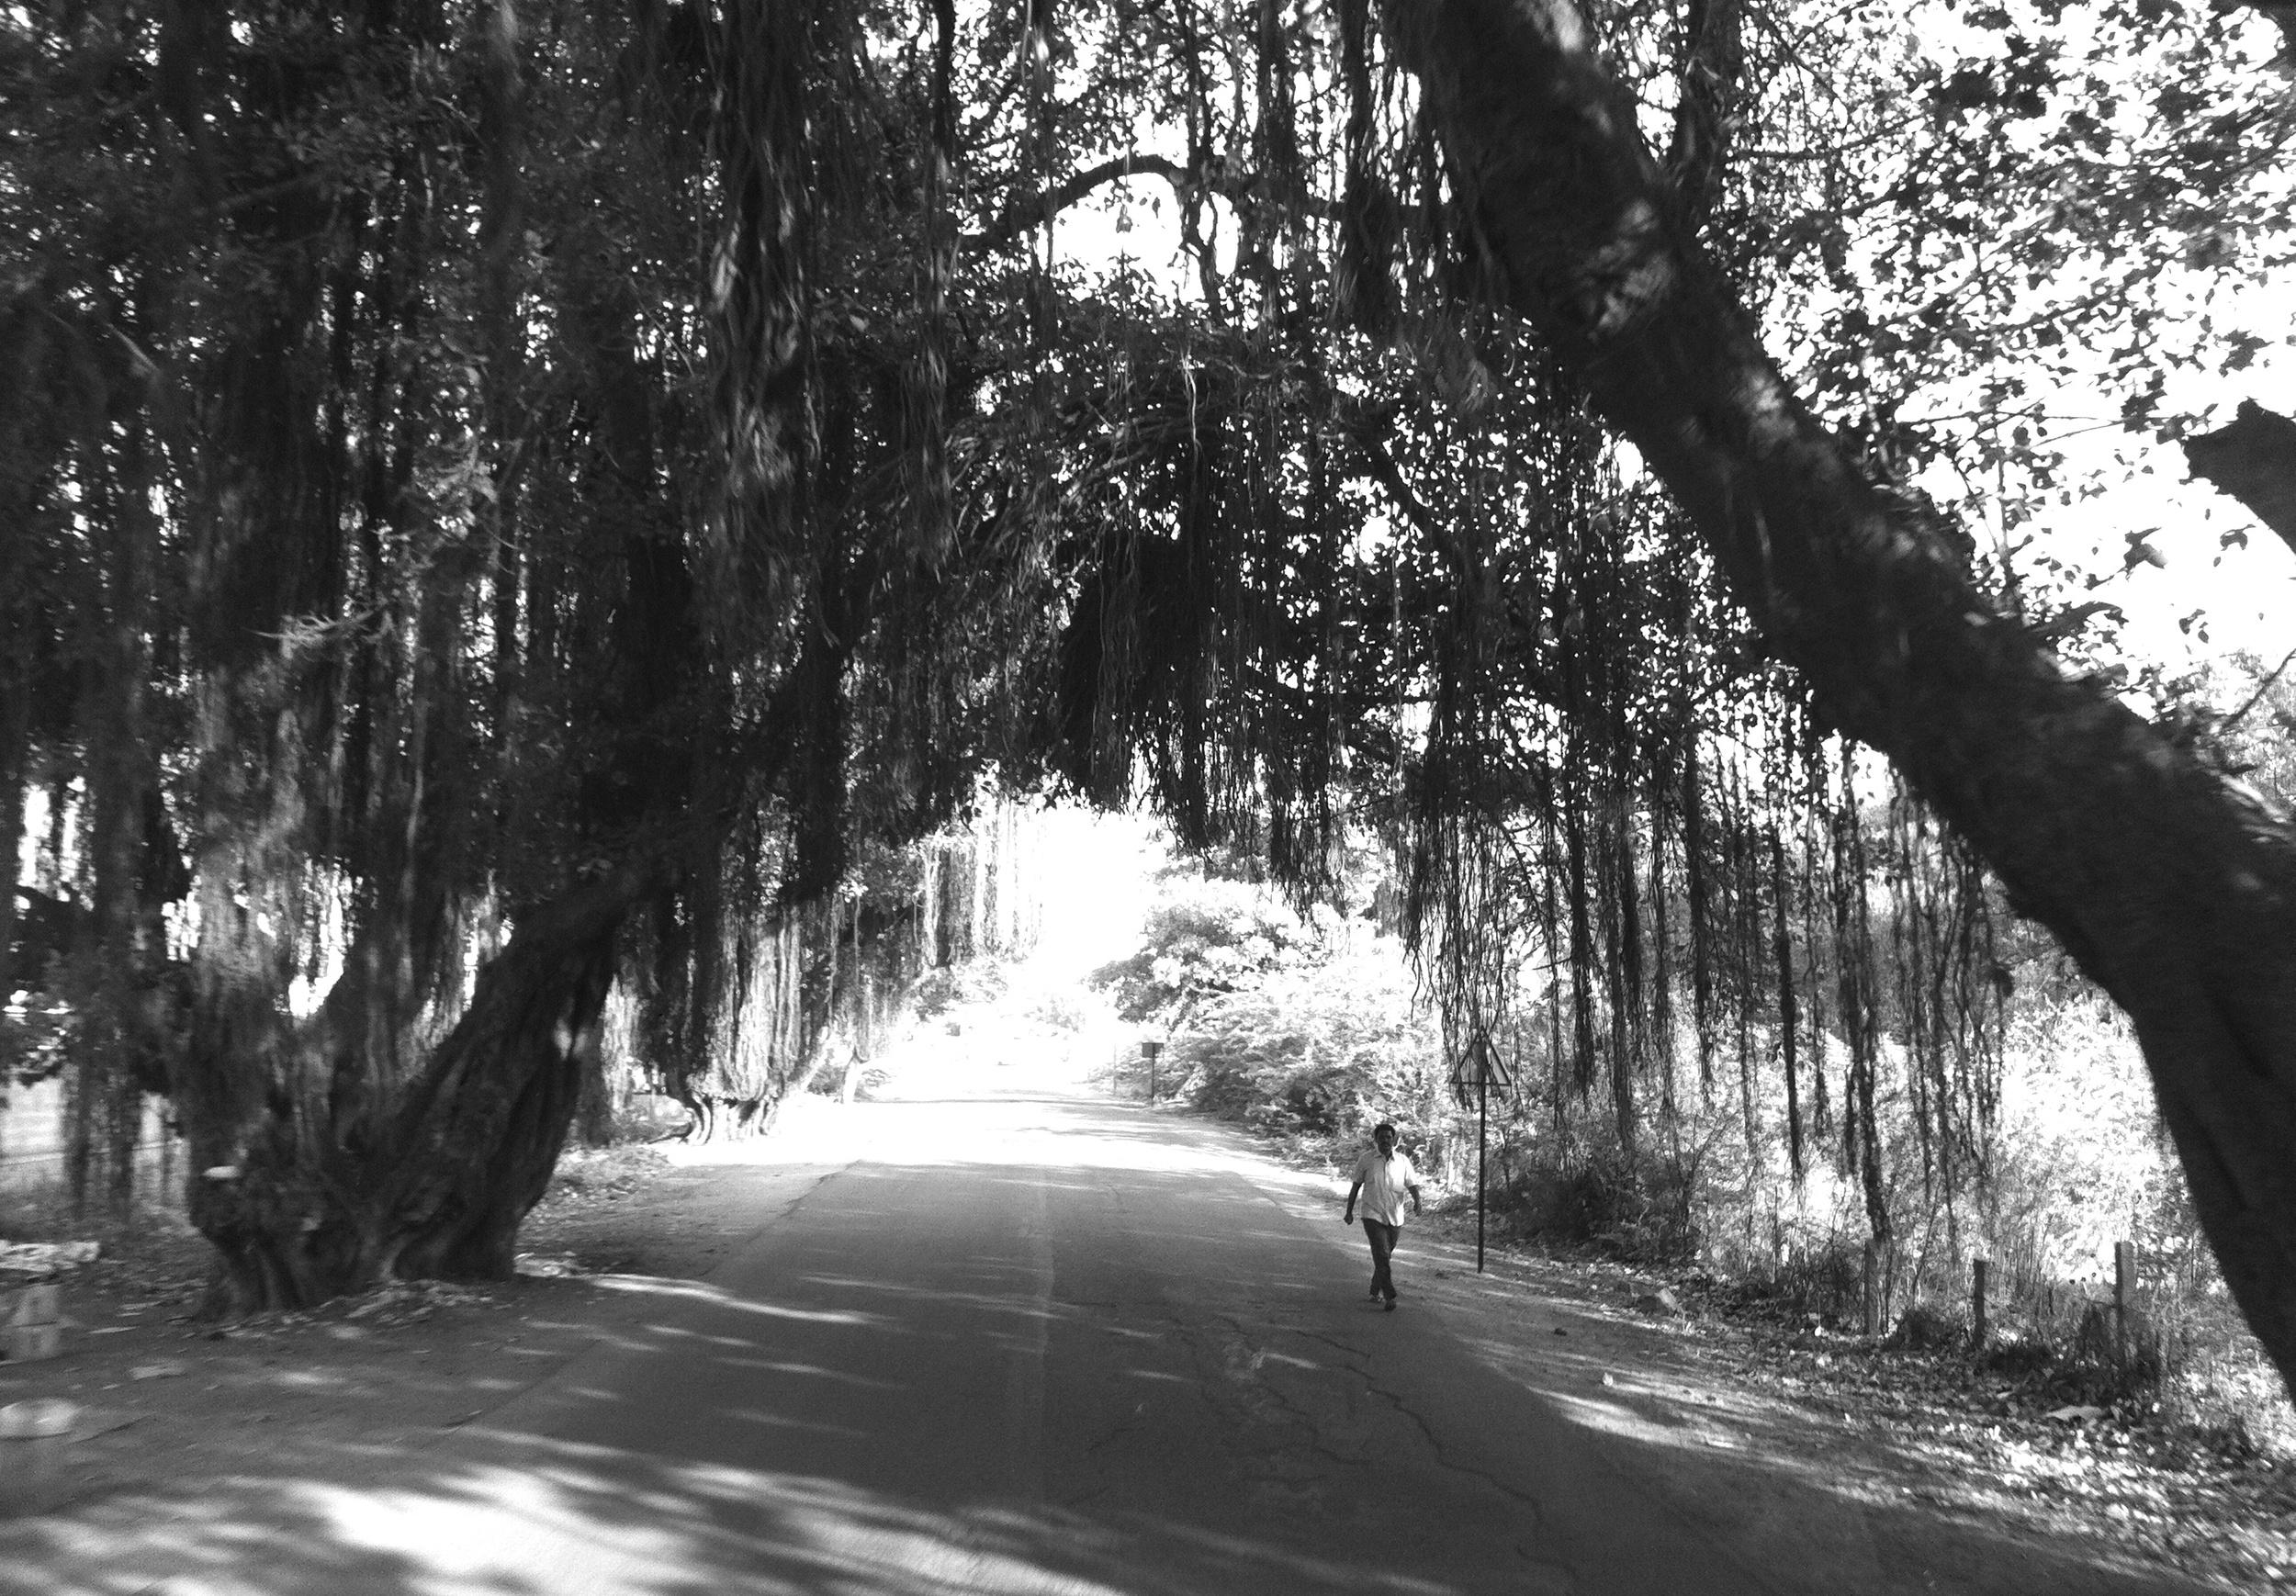 banyan tree underpasses